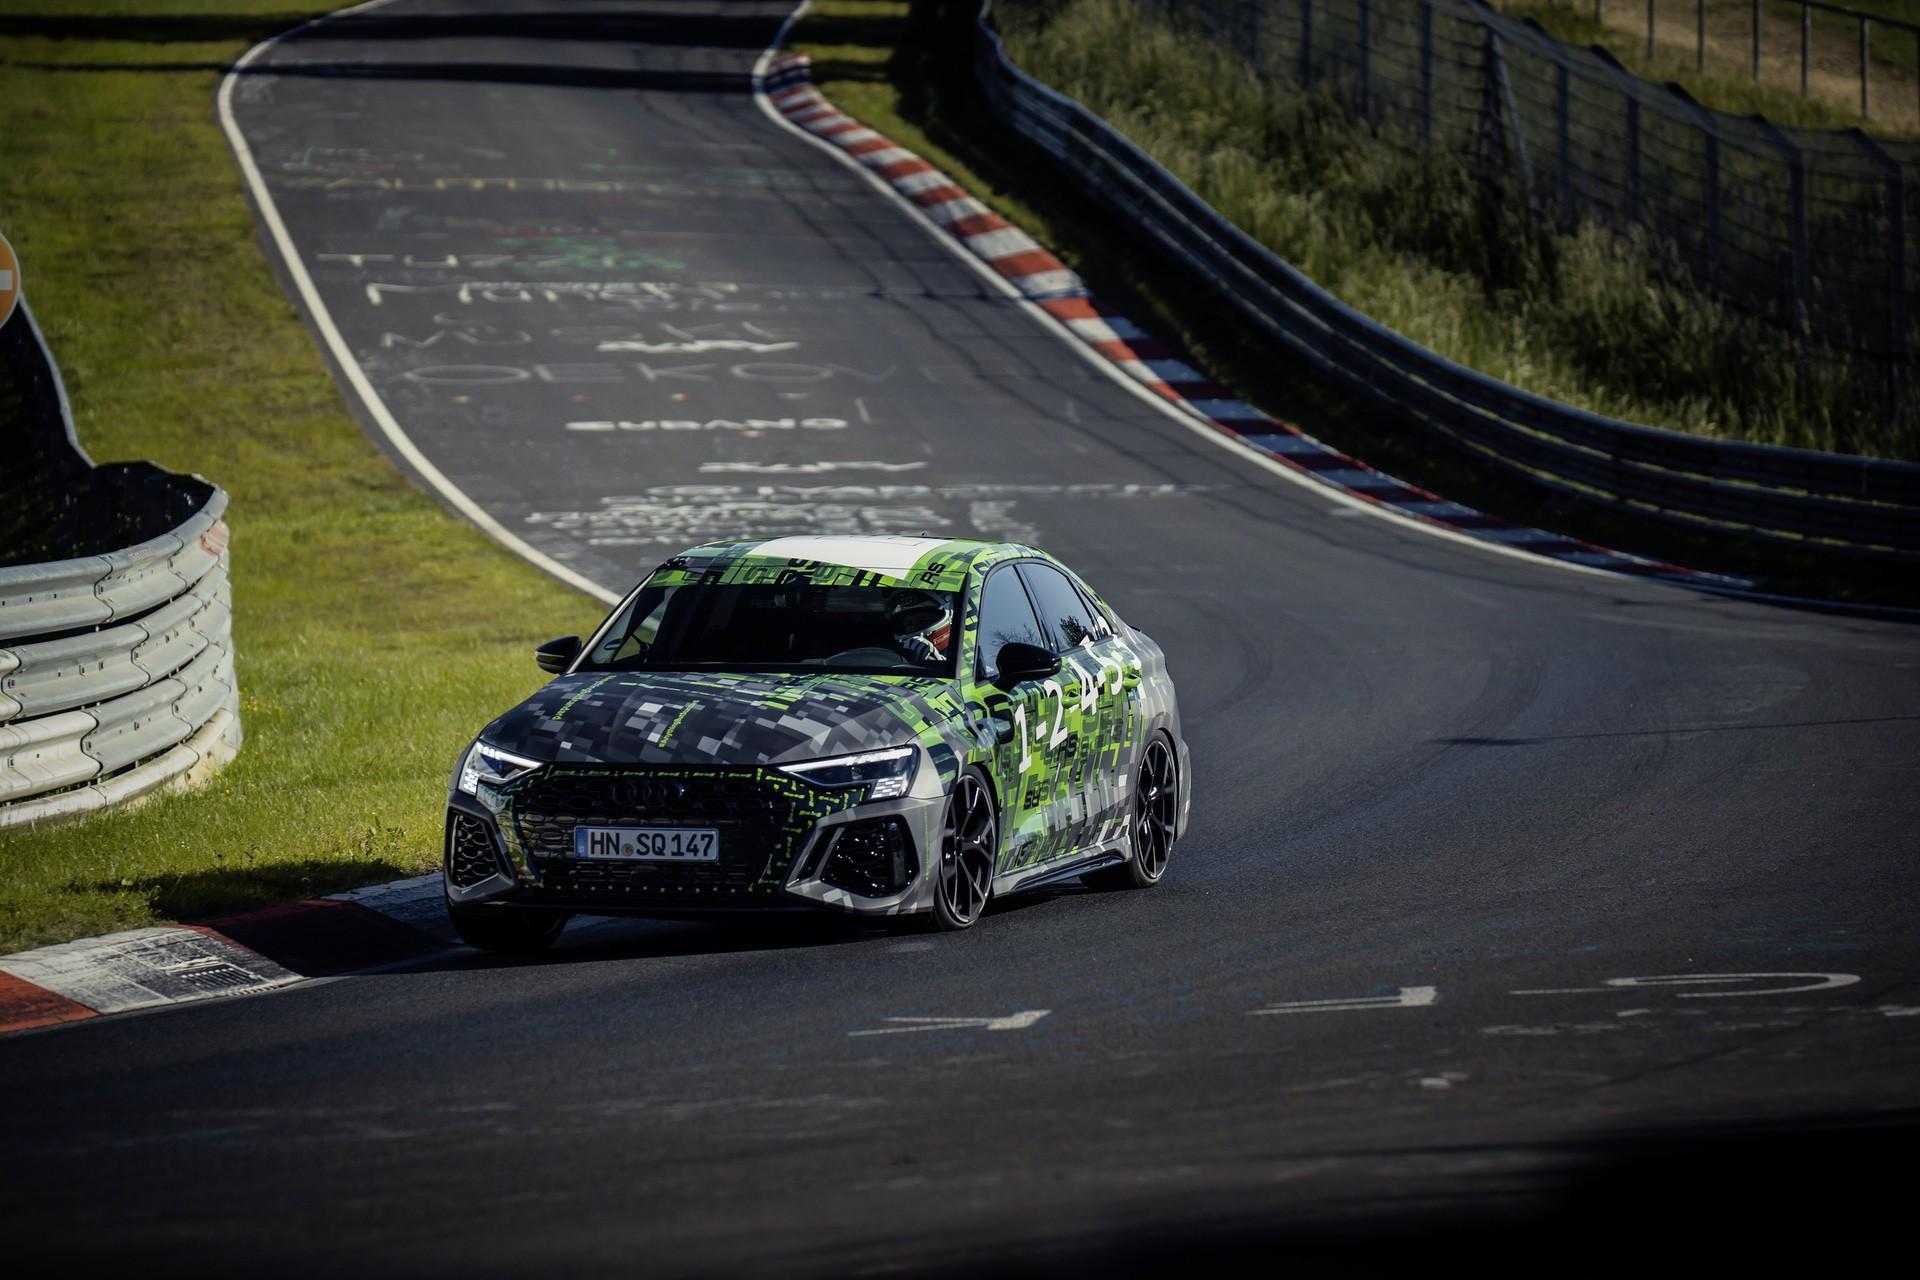 Audi_RS3_Sedan_Nurburgring_lap_record-0009